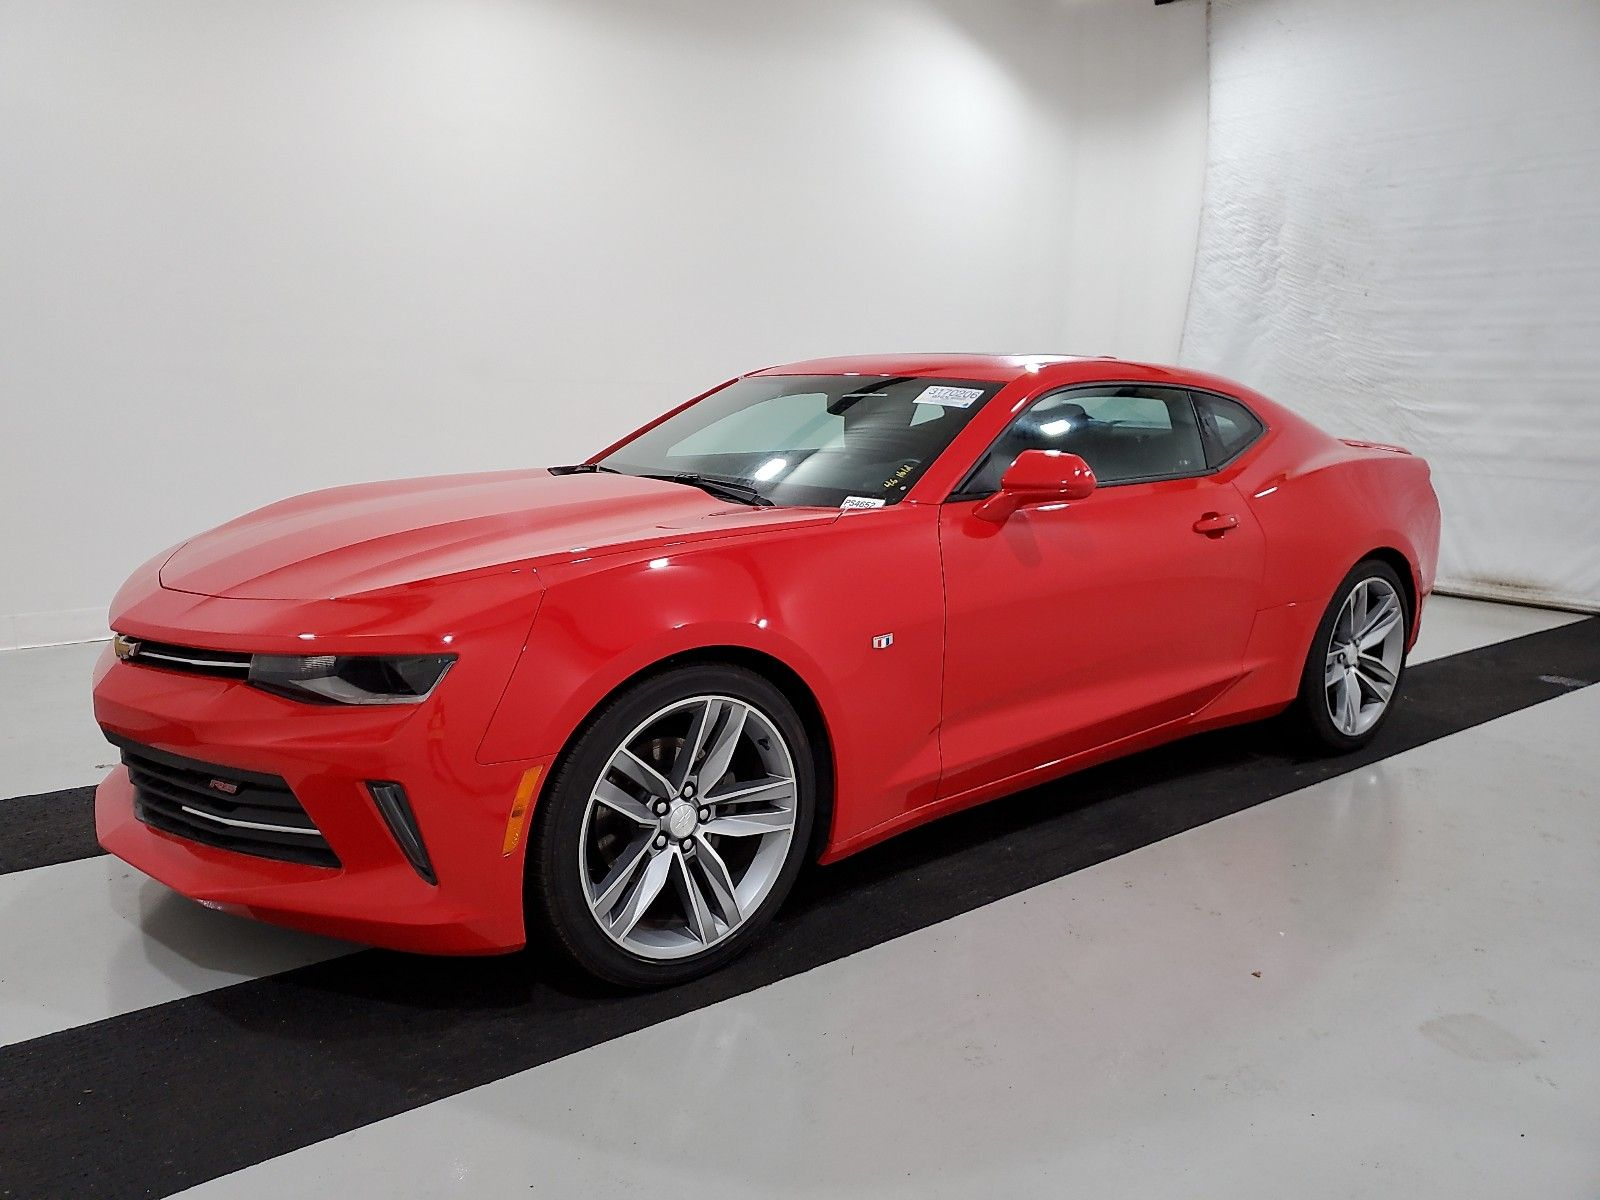 2018 Chevrolet Camaro 3.6. Lot 99913769701 Vin 1G1FB1RS2J0173415